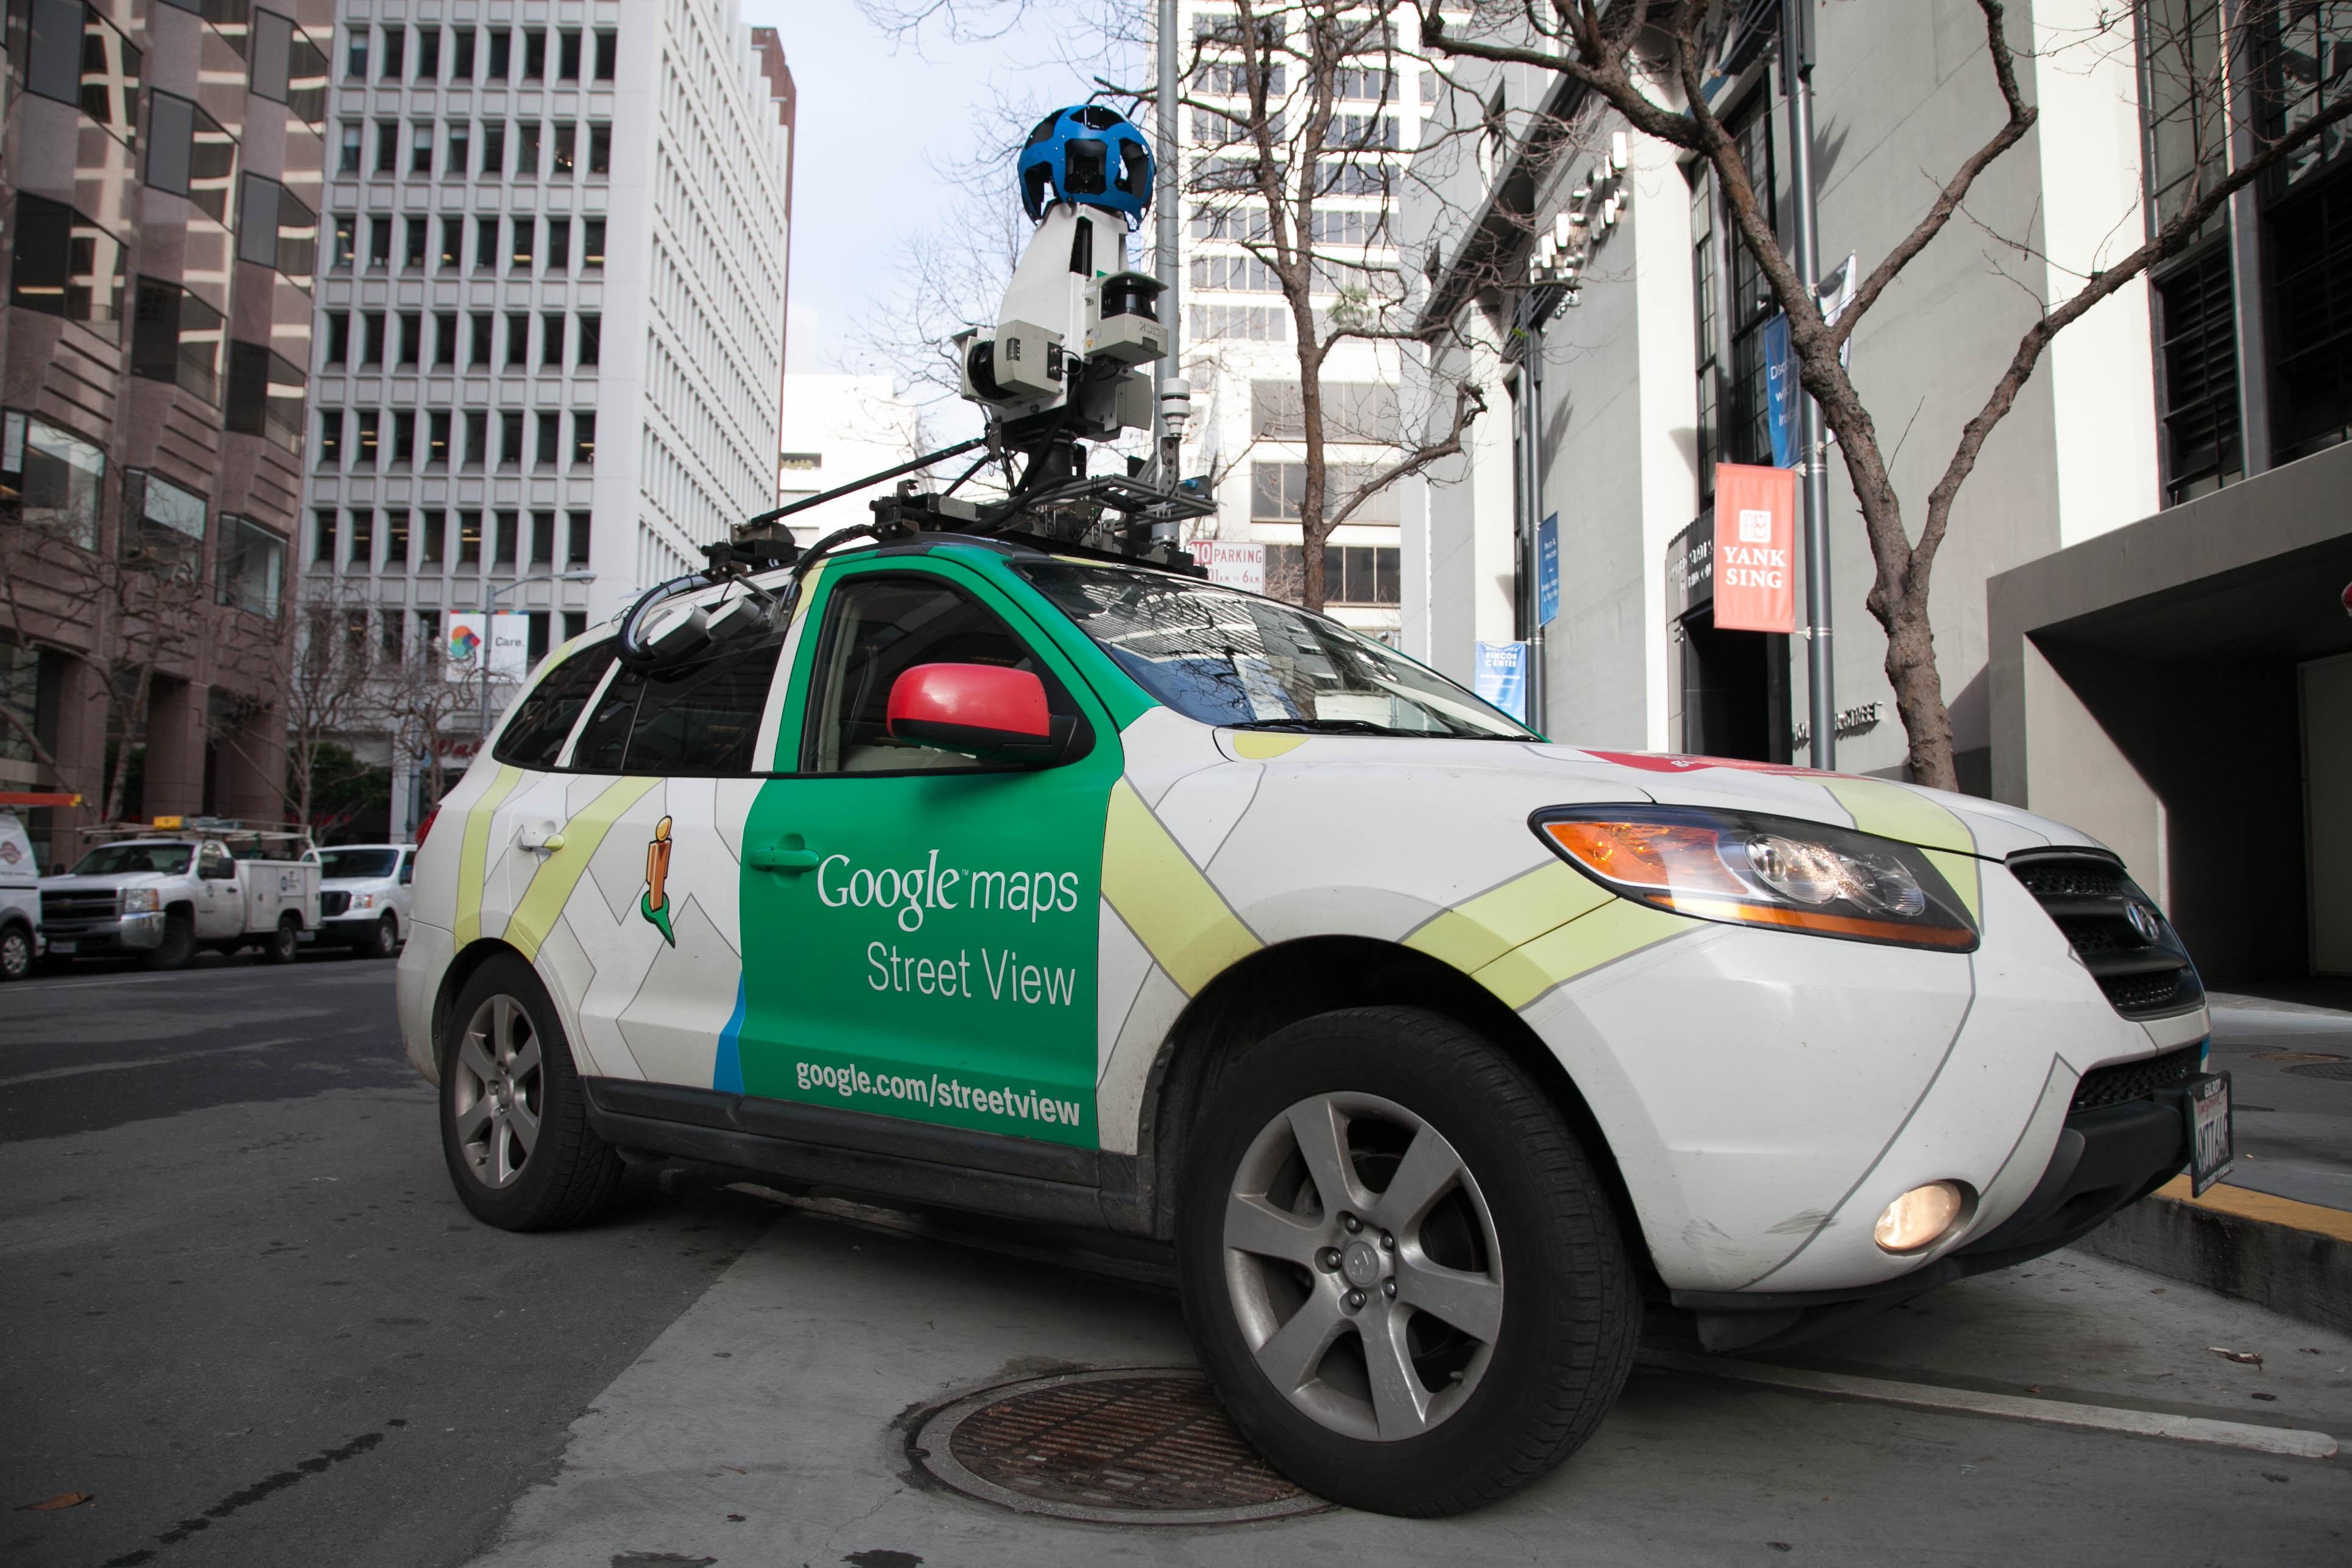 Google Street View car with an Aclima air pollution sensor